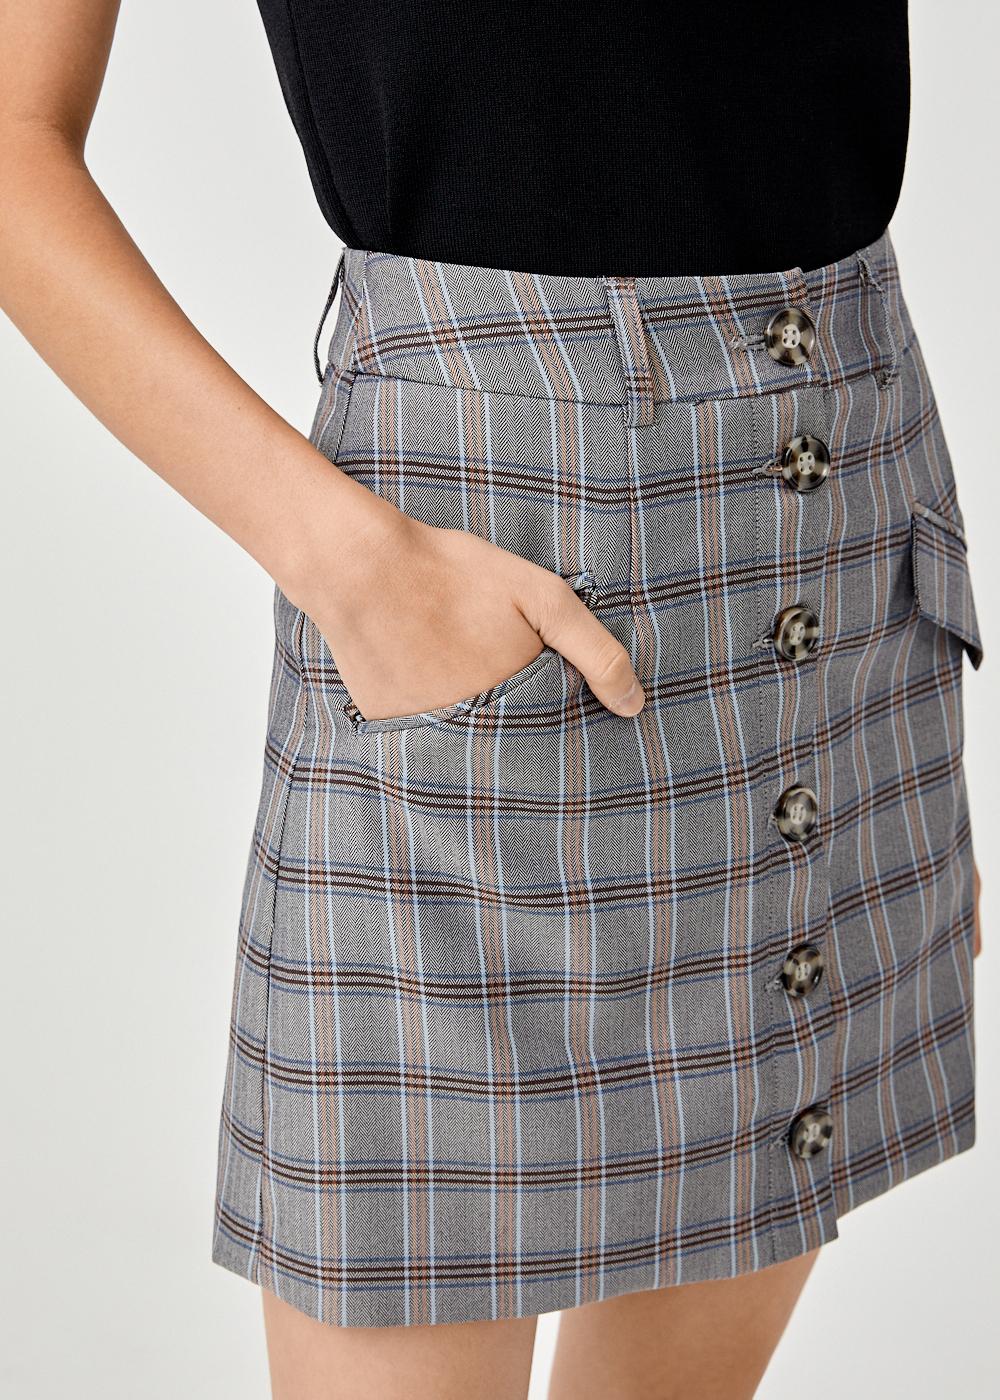 Nathalia Plaid A-line Mini Skirt